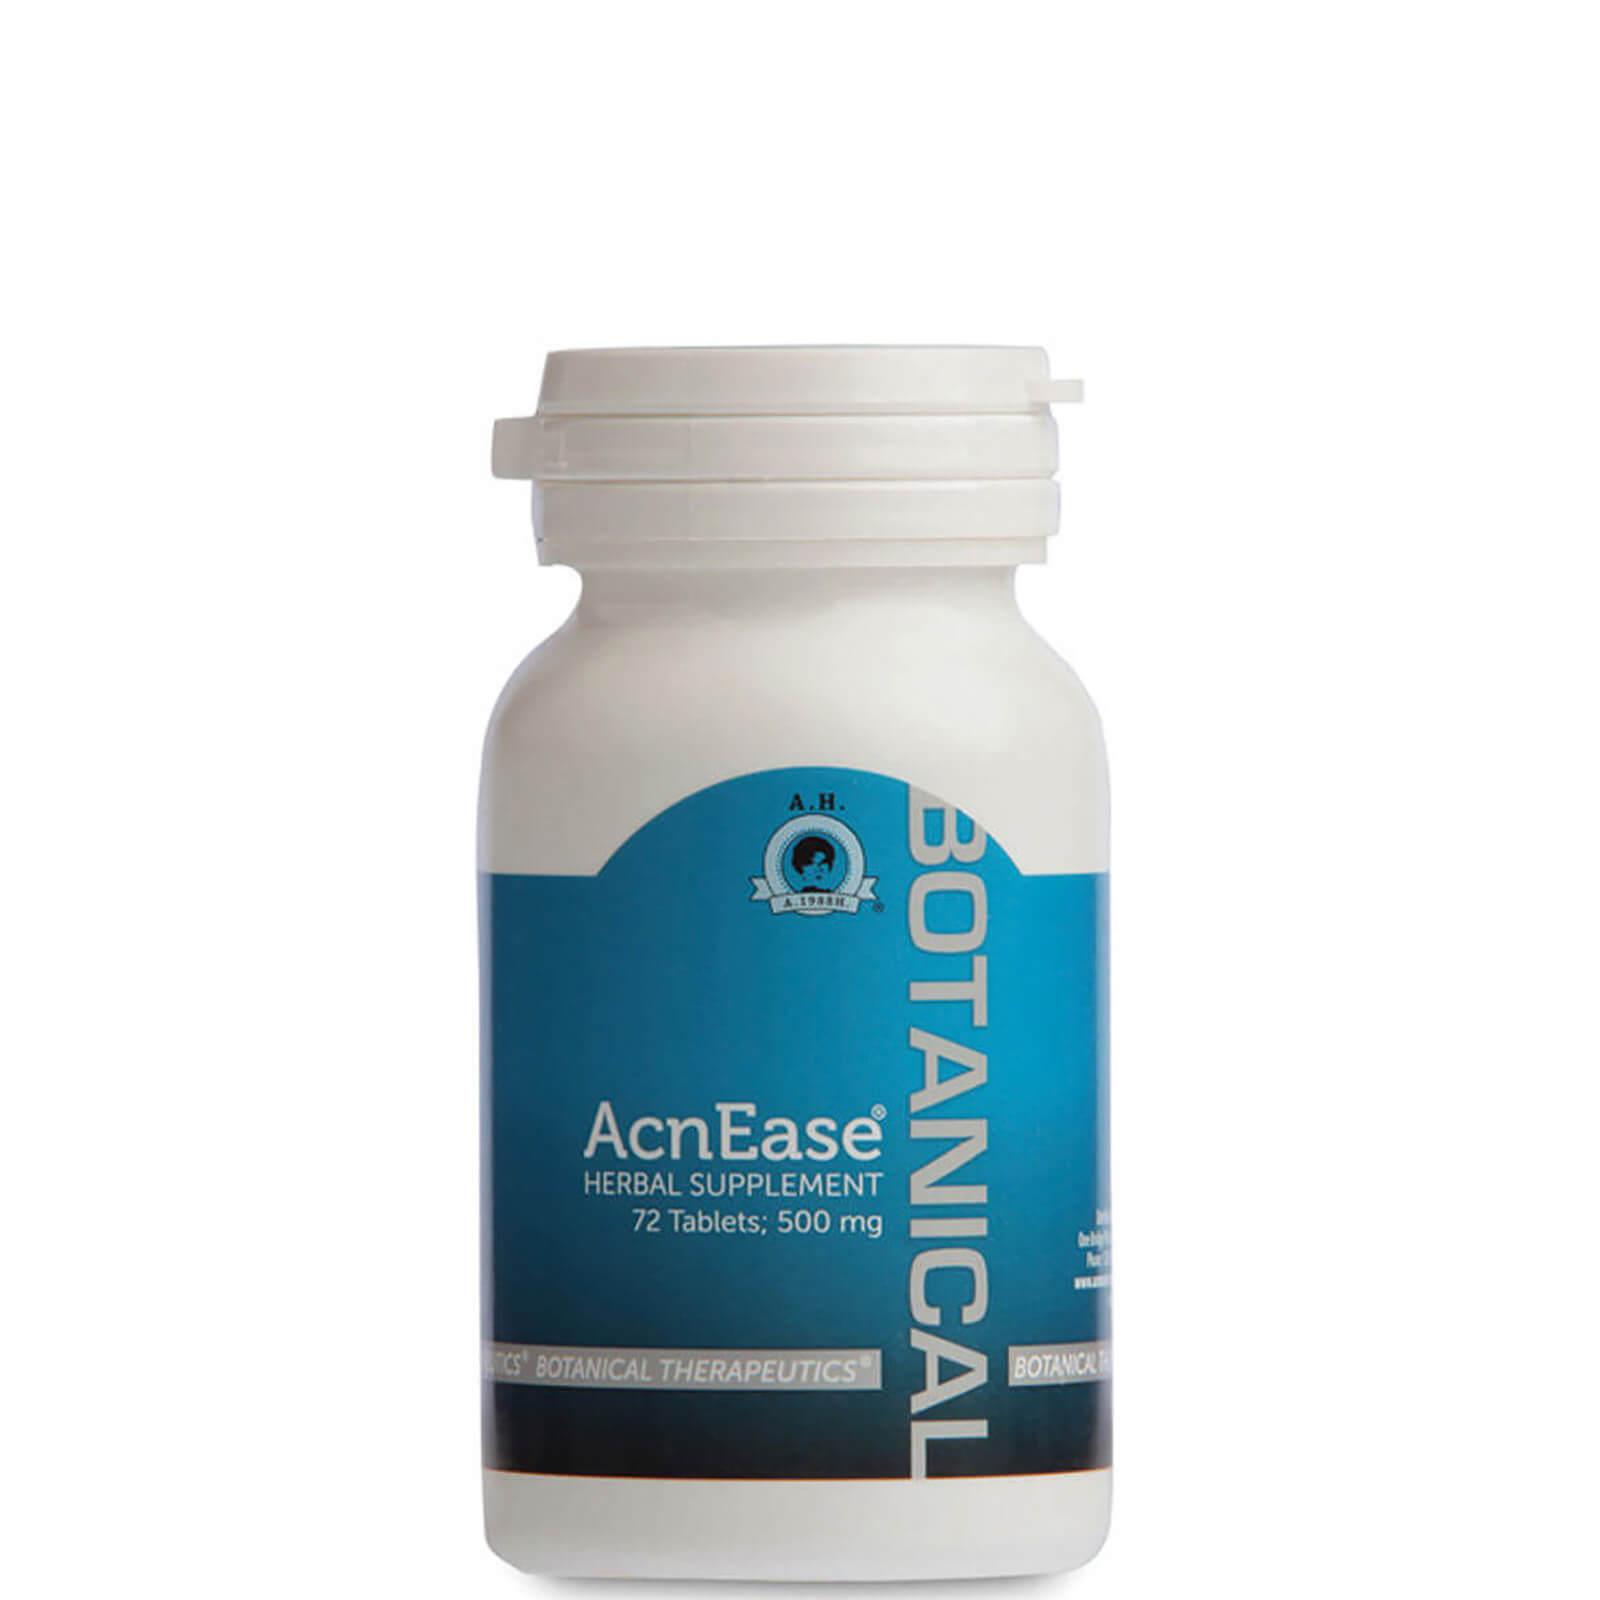 Купить Препарат поддерживающего лечения при акне AcnEase Acne Maintenance Treatment - 1 флакон